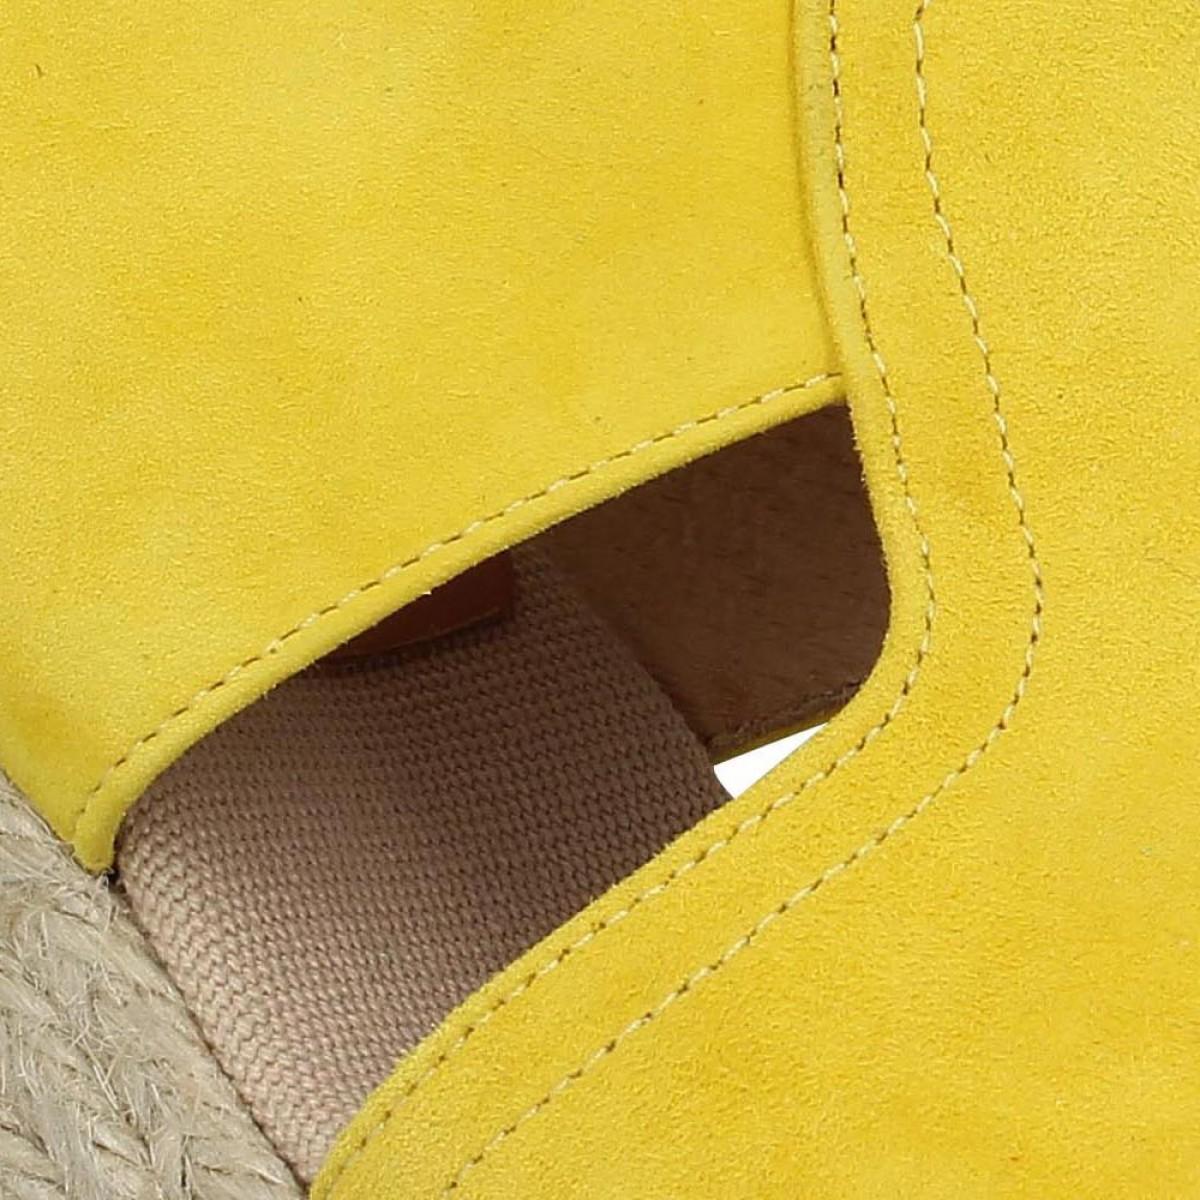 Kanna 5241 velours jaune femme | Fanny chaussures